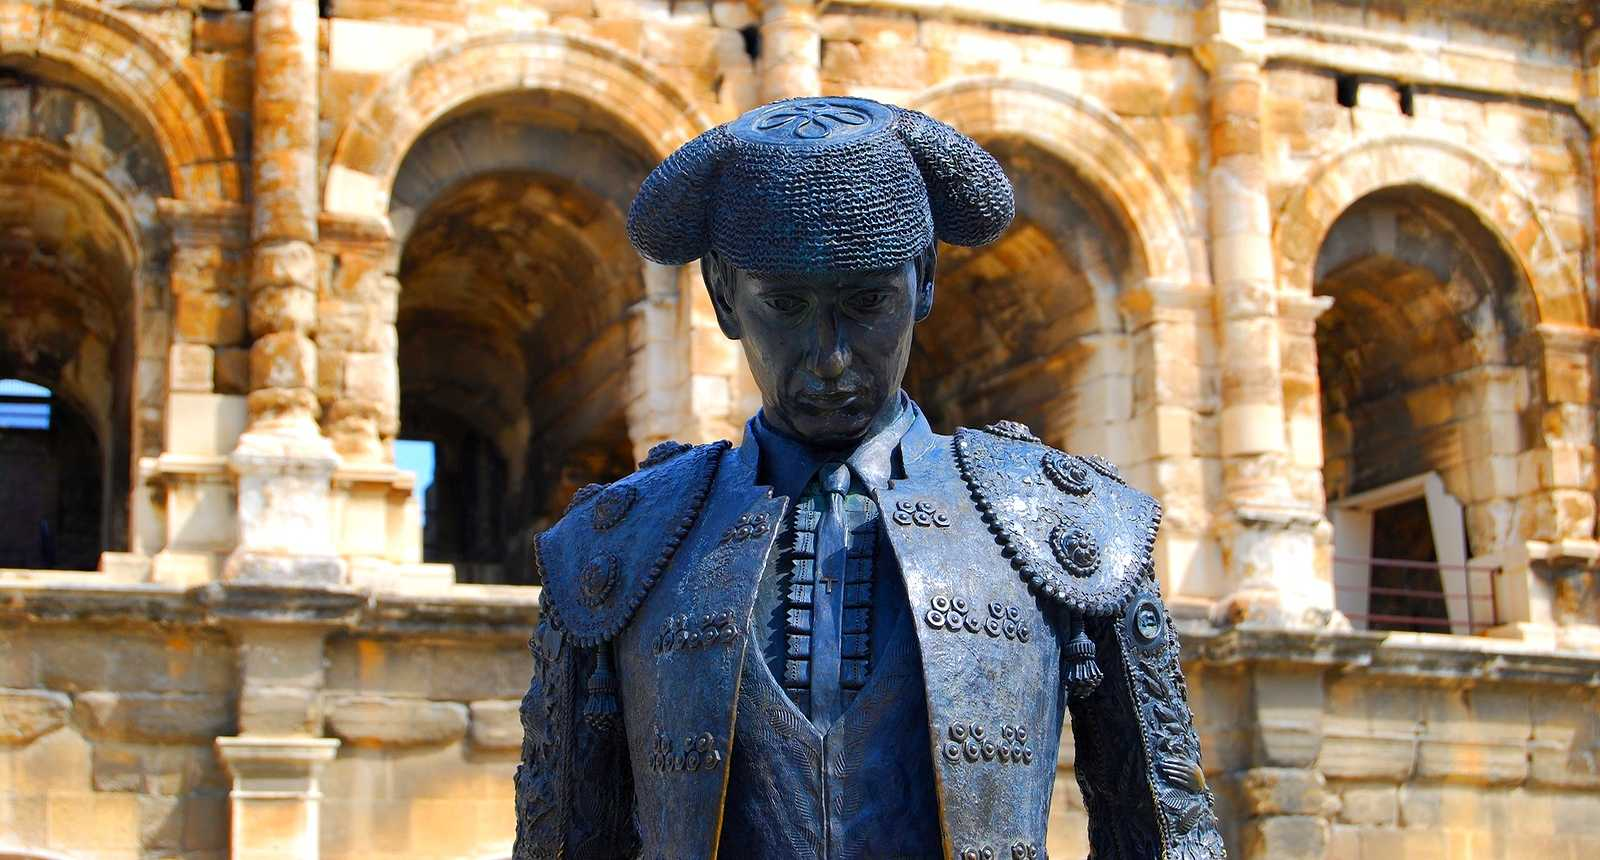 Statue de Nimeno II devant les Arènes de Nîmes